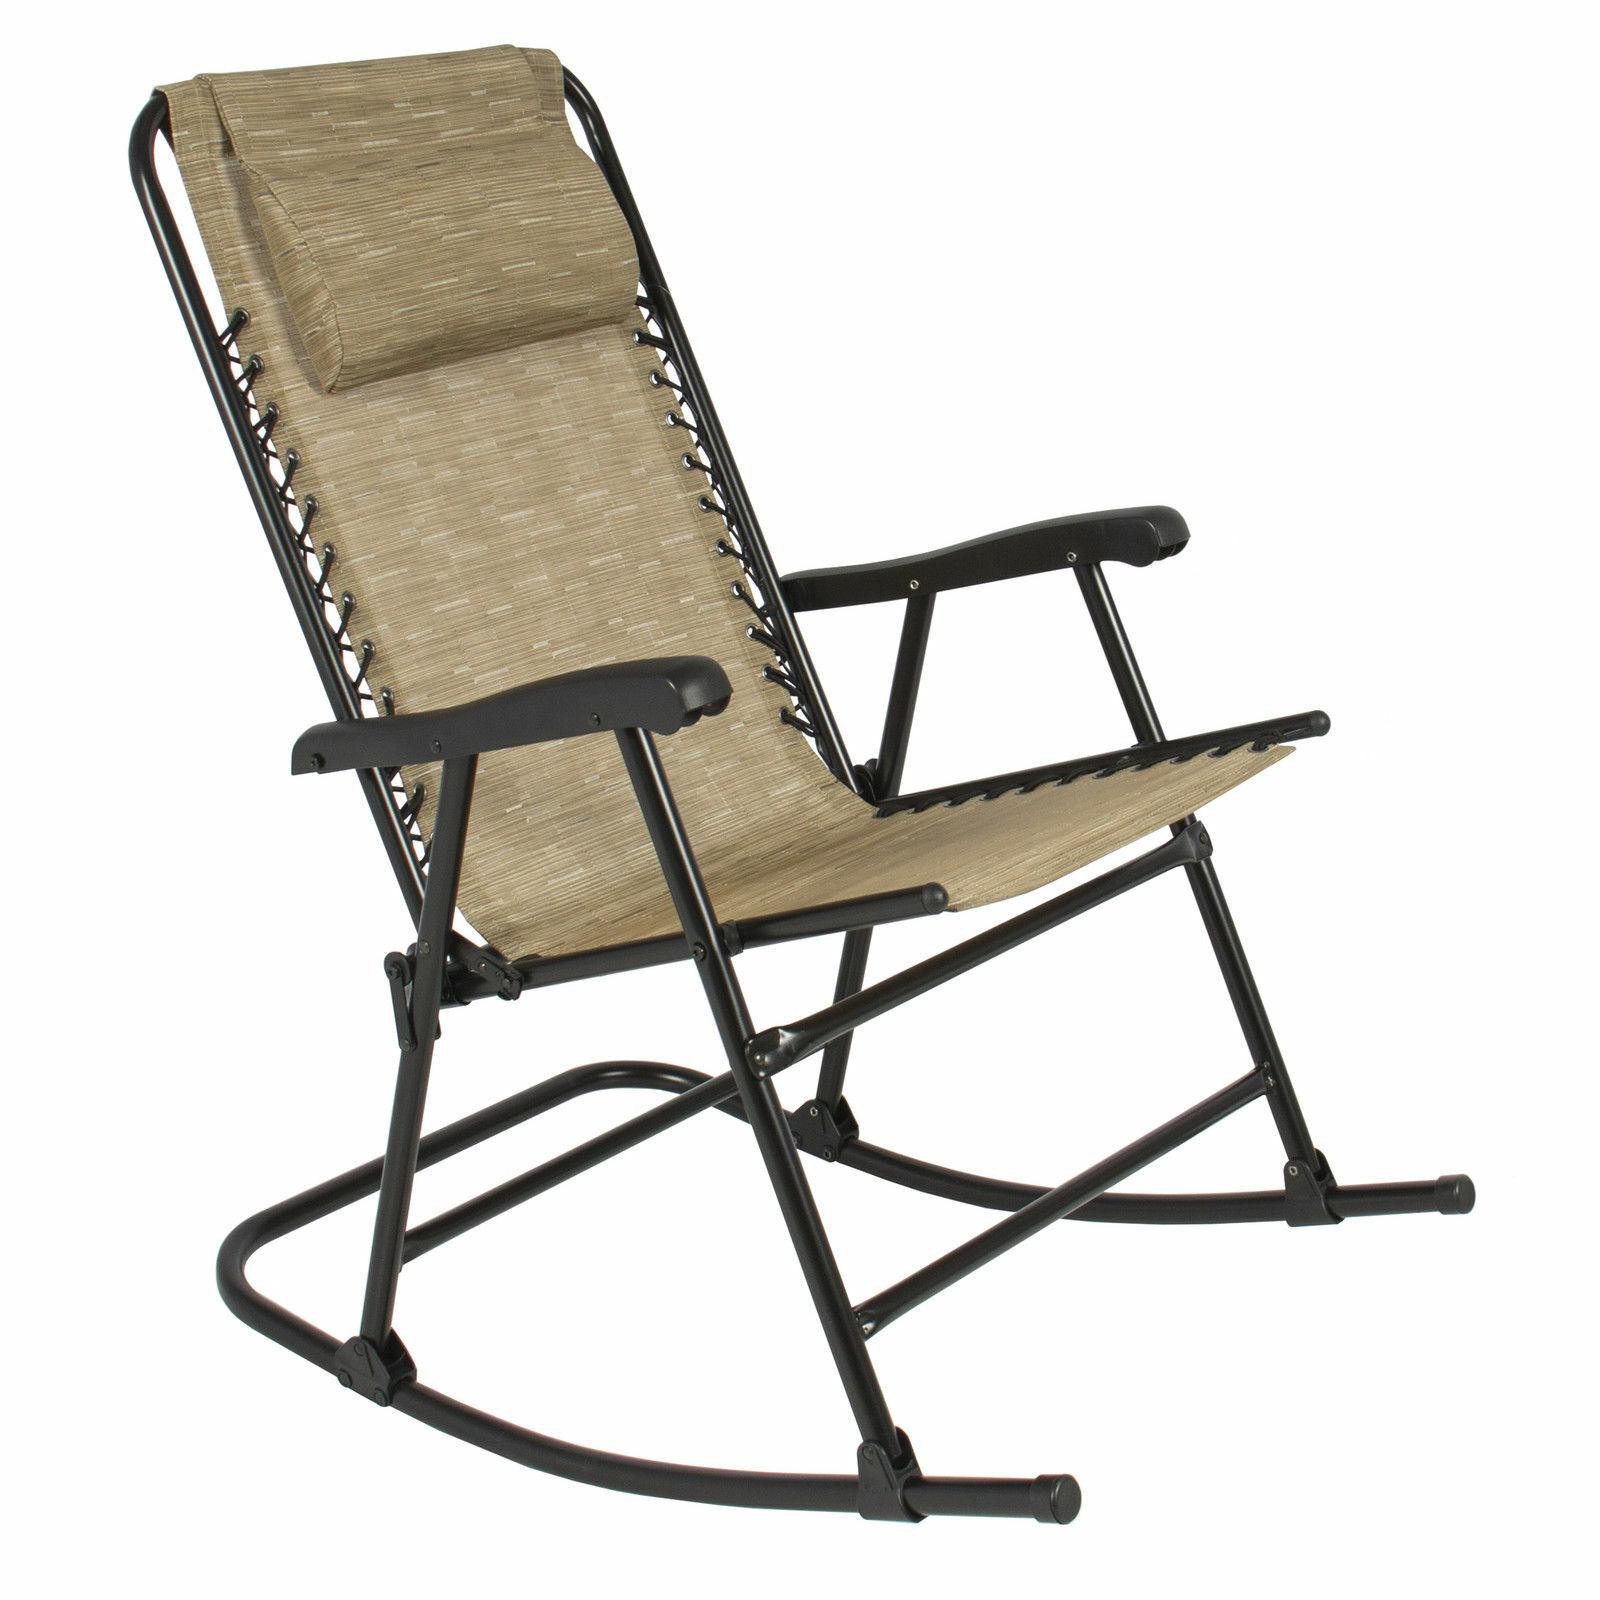 Folding Rocking Chair Foldable Rocker Outdoor Patio Furnitur